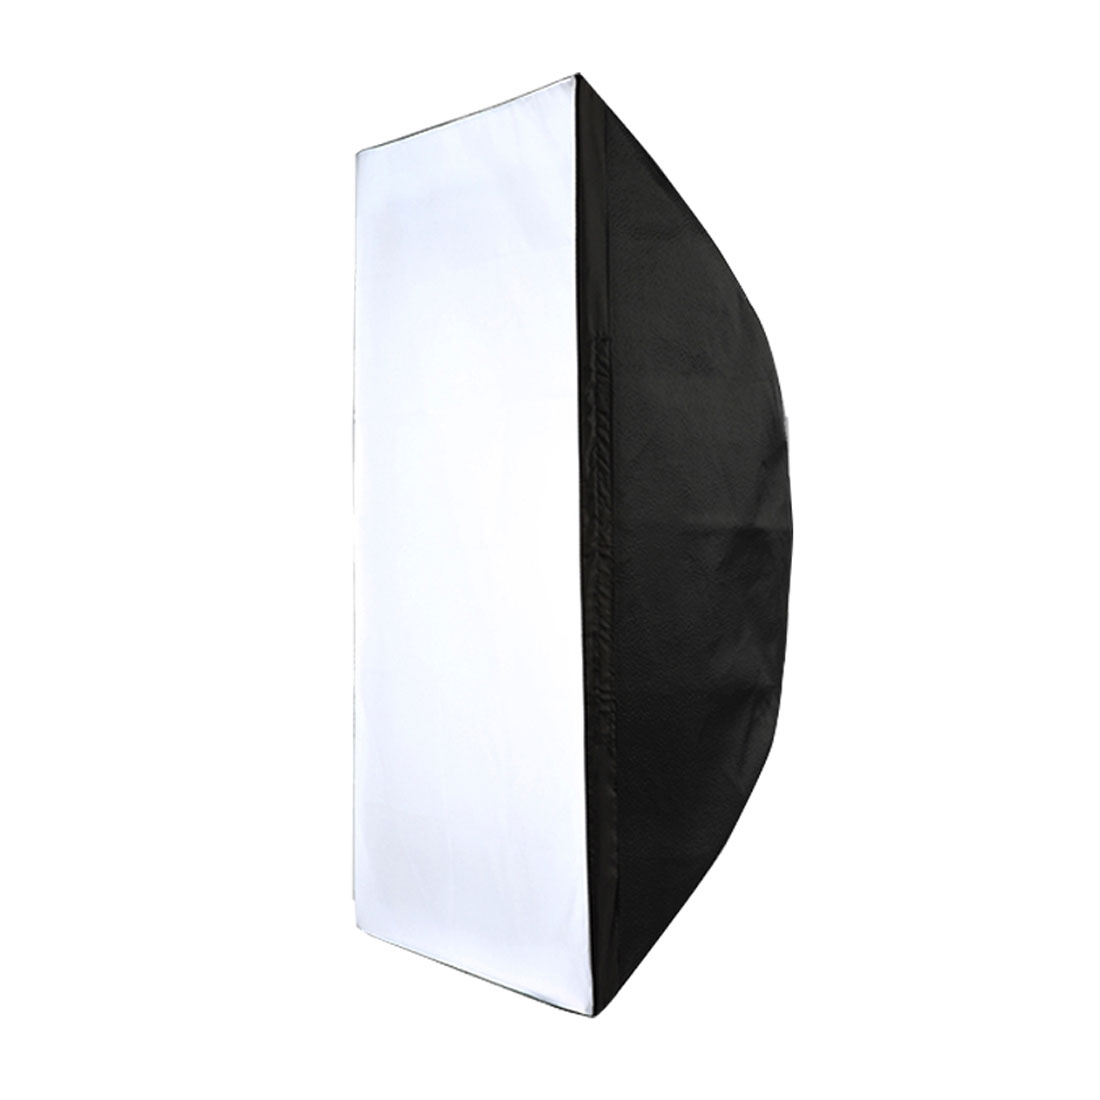 60cmx90cm Black Silver Tone Umbrella Studio Flash Light Soft Box Diffuser Reflector